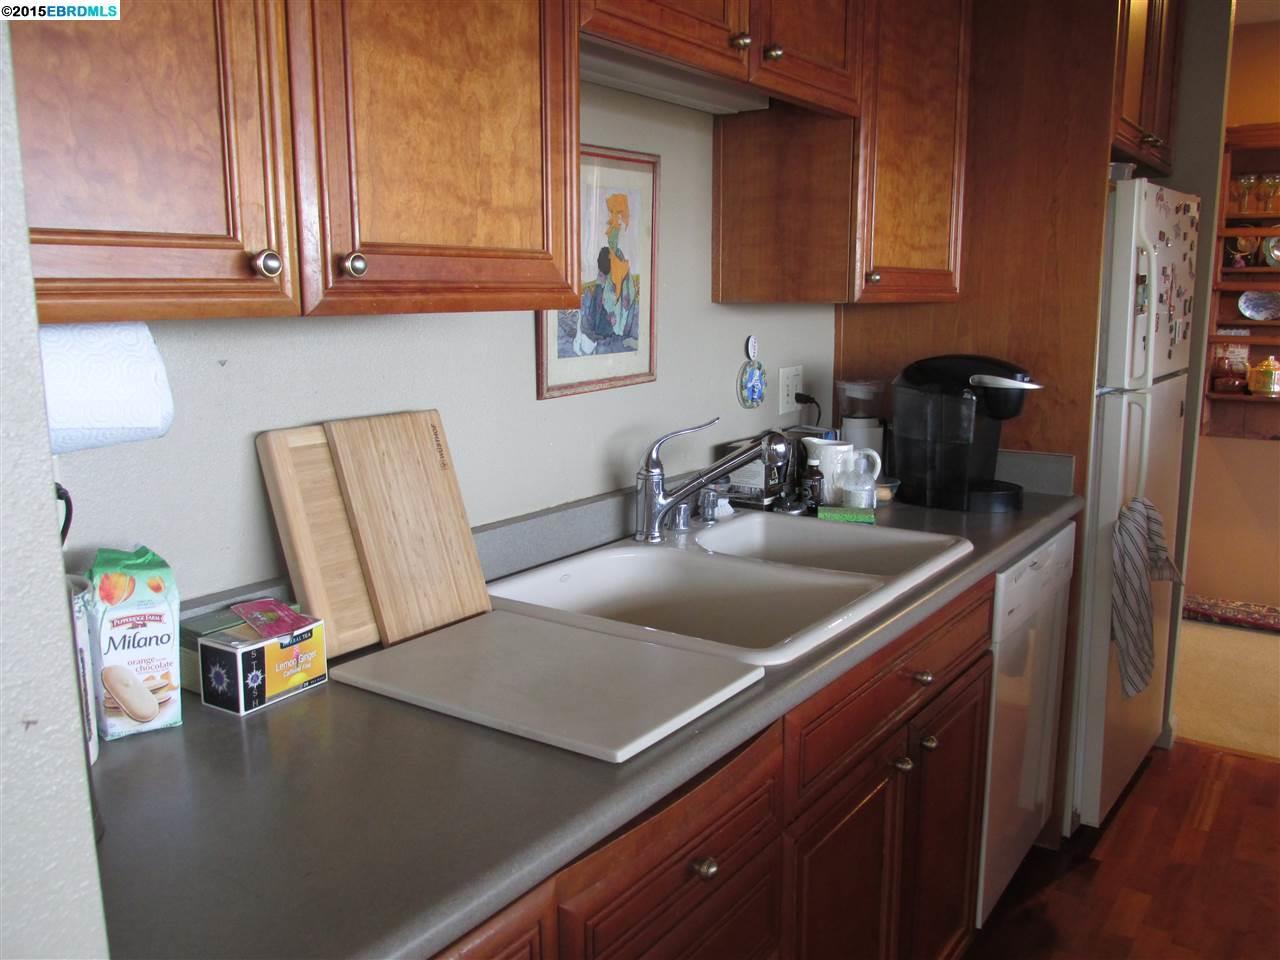 Additional photo for property listing at 565 Bellevue  Oakland, Kalifornien 94610 Vereinigte Staaten